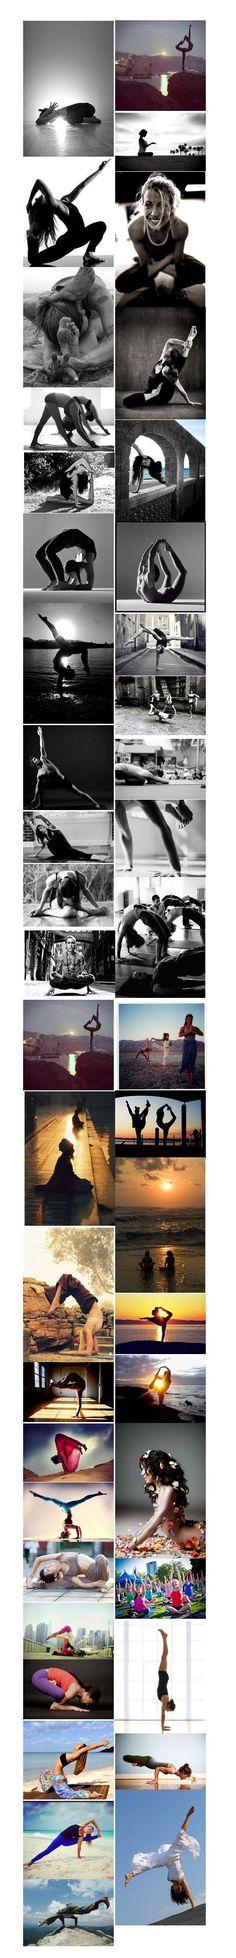 Life of Yoga